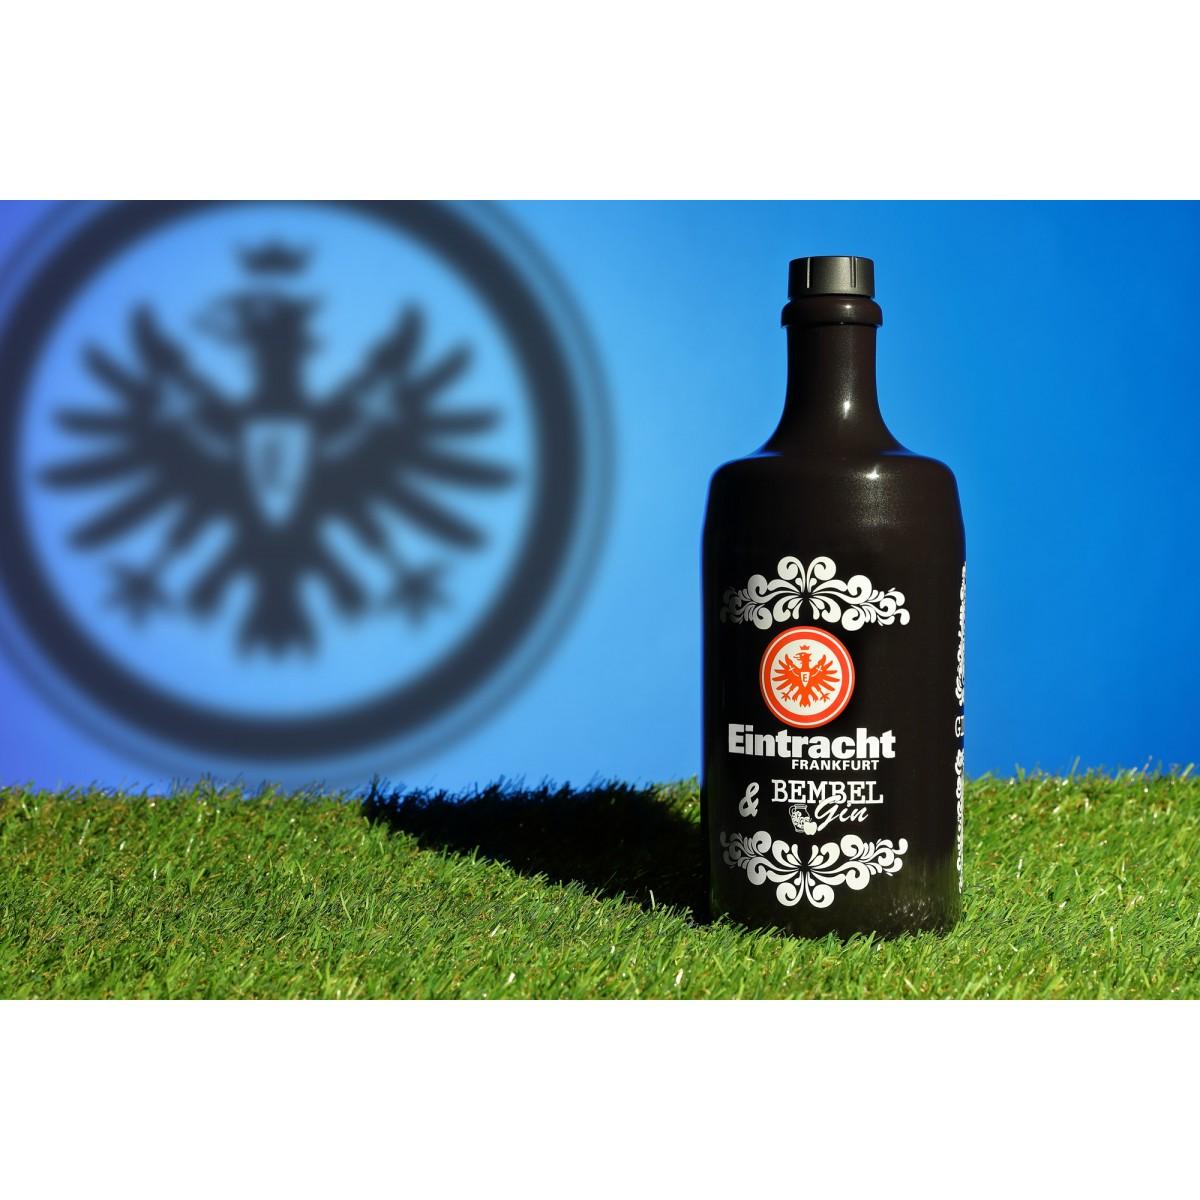 Bembel Gin Eintracht Frankfurt Fan Edition